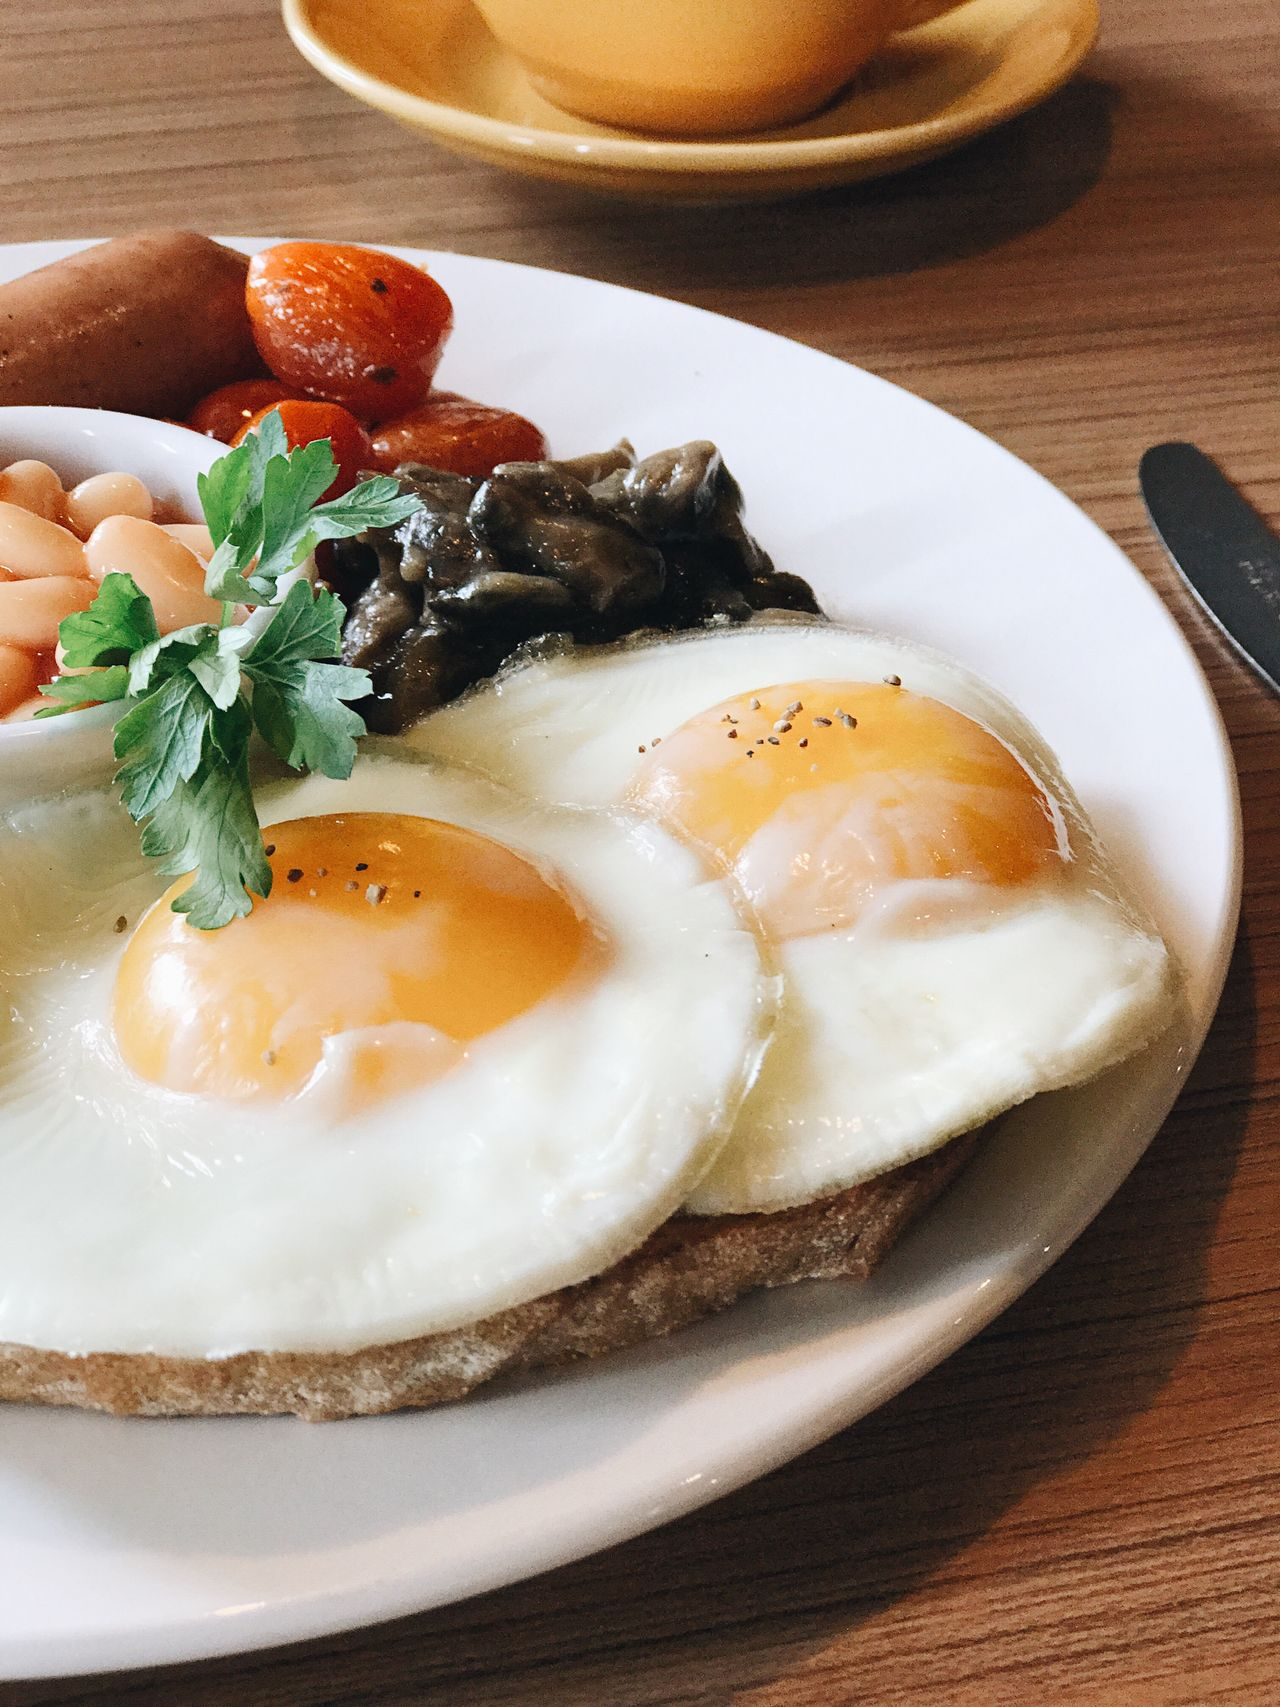 Cafe Pursuepretty Chasinglight Breakfast Bae  Eggs Sunny Side Breakfast Platter Food Yummy Delicious Foodphotography